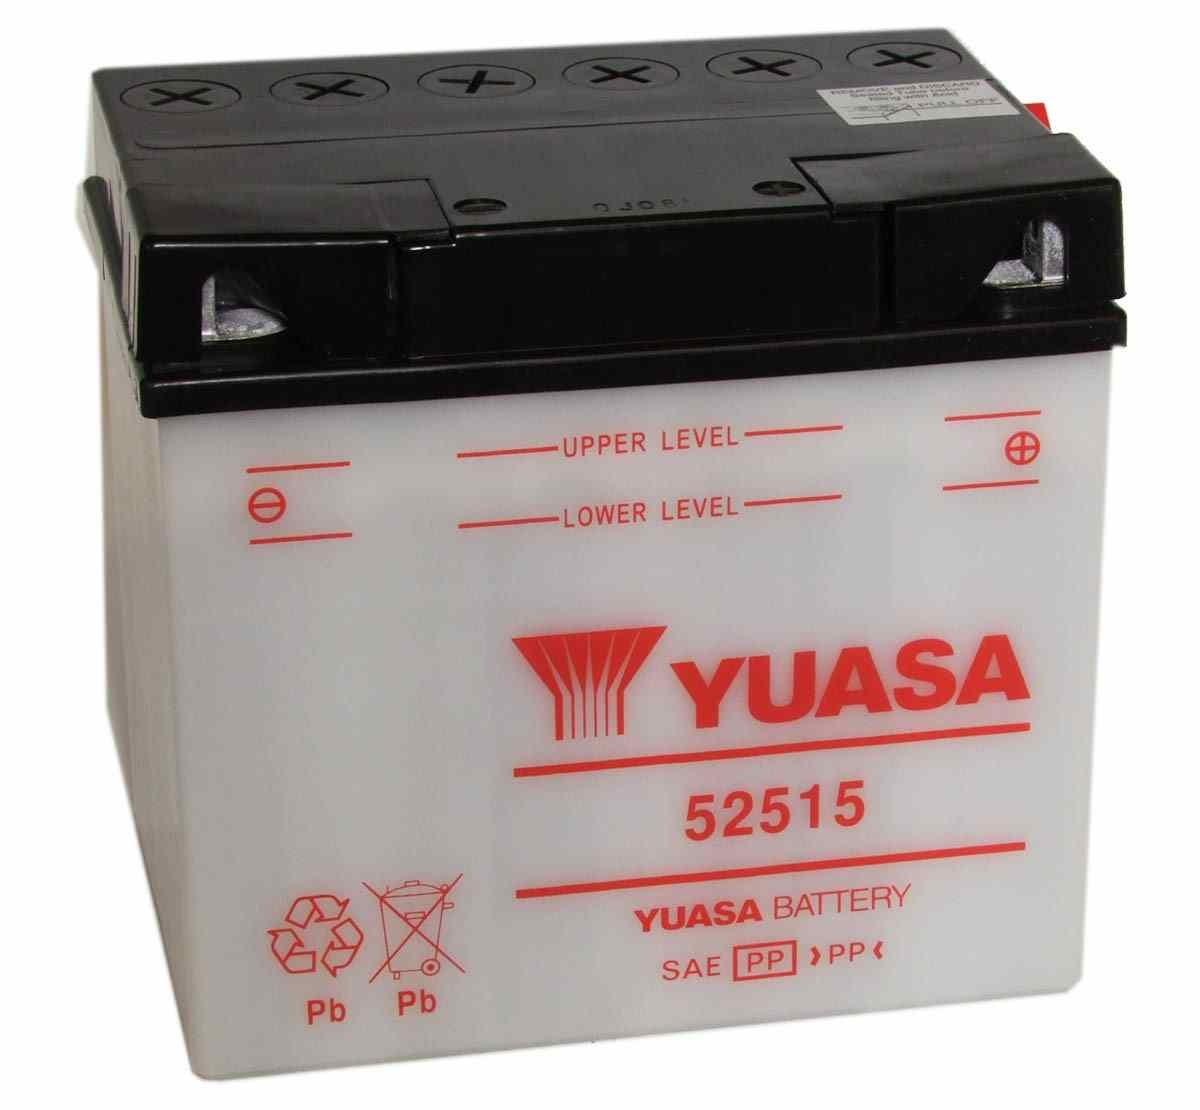 Bateria para moto o ciclomotor marca YUASA modelo 52515 de 12v 25Ah